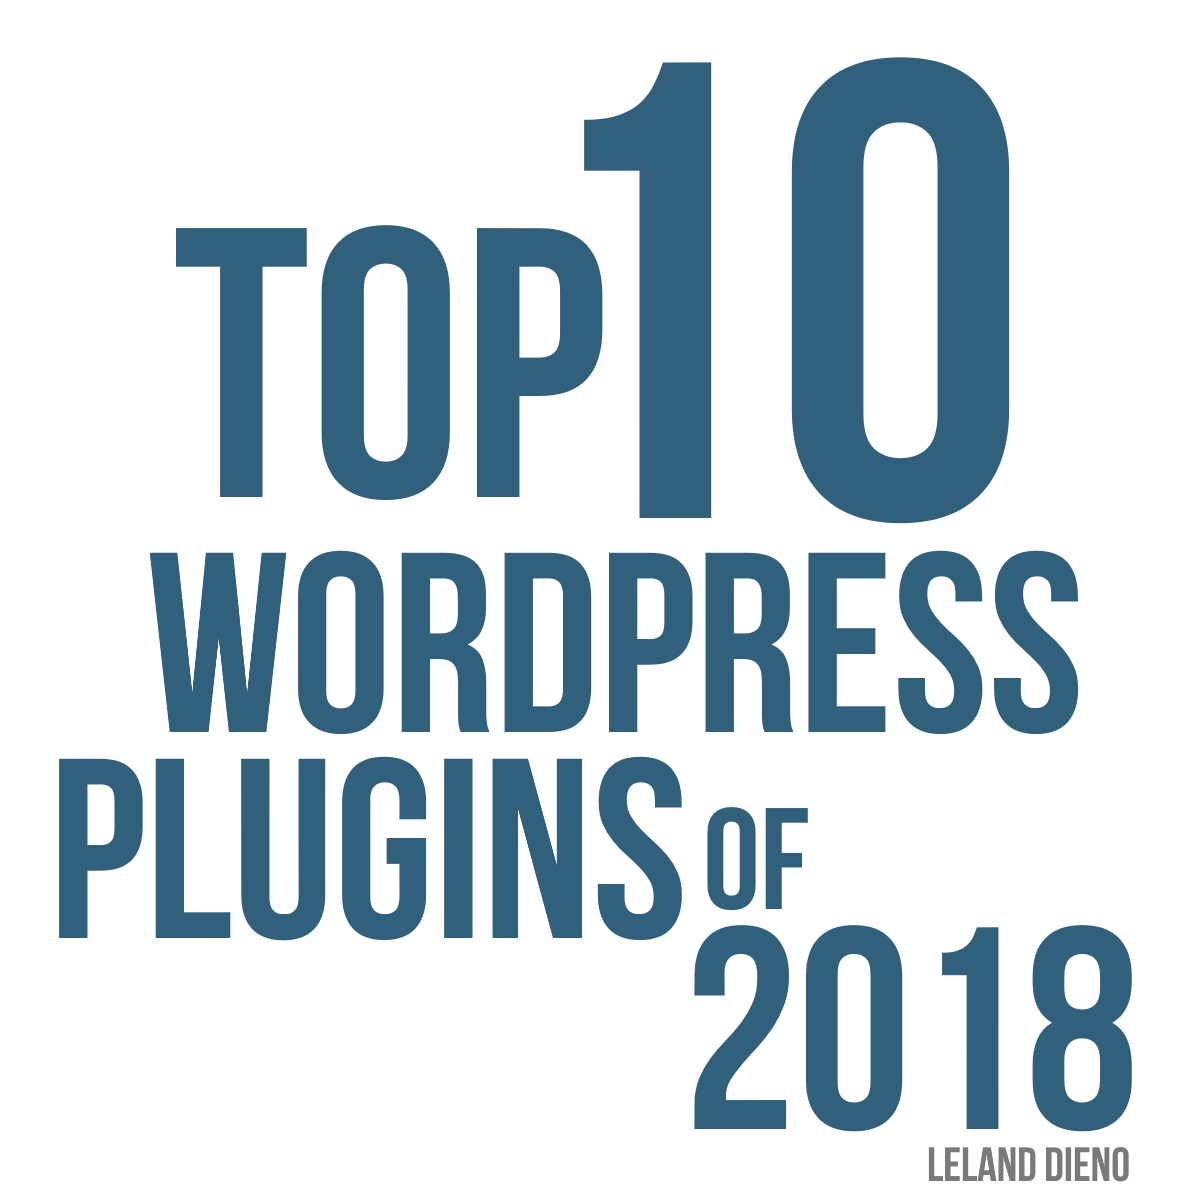 Top 10 free WordPress plugins of 2018